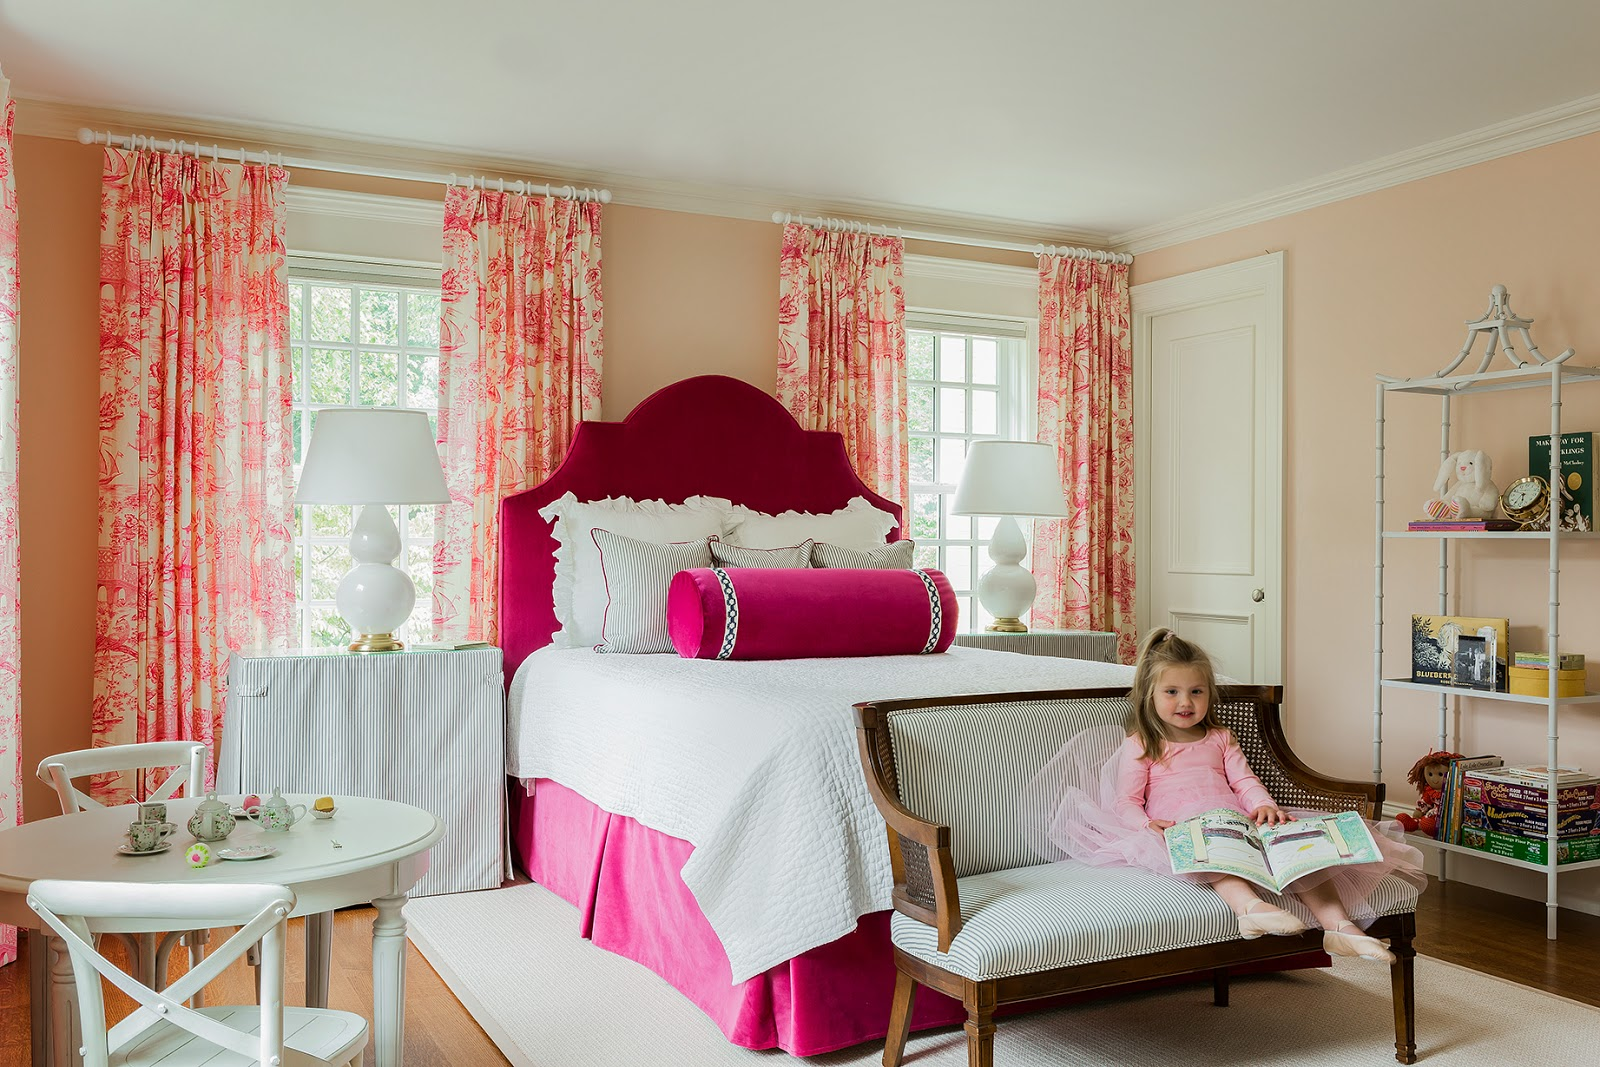 Sabbe Interior Design the blog Big Sister s Room